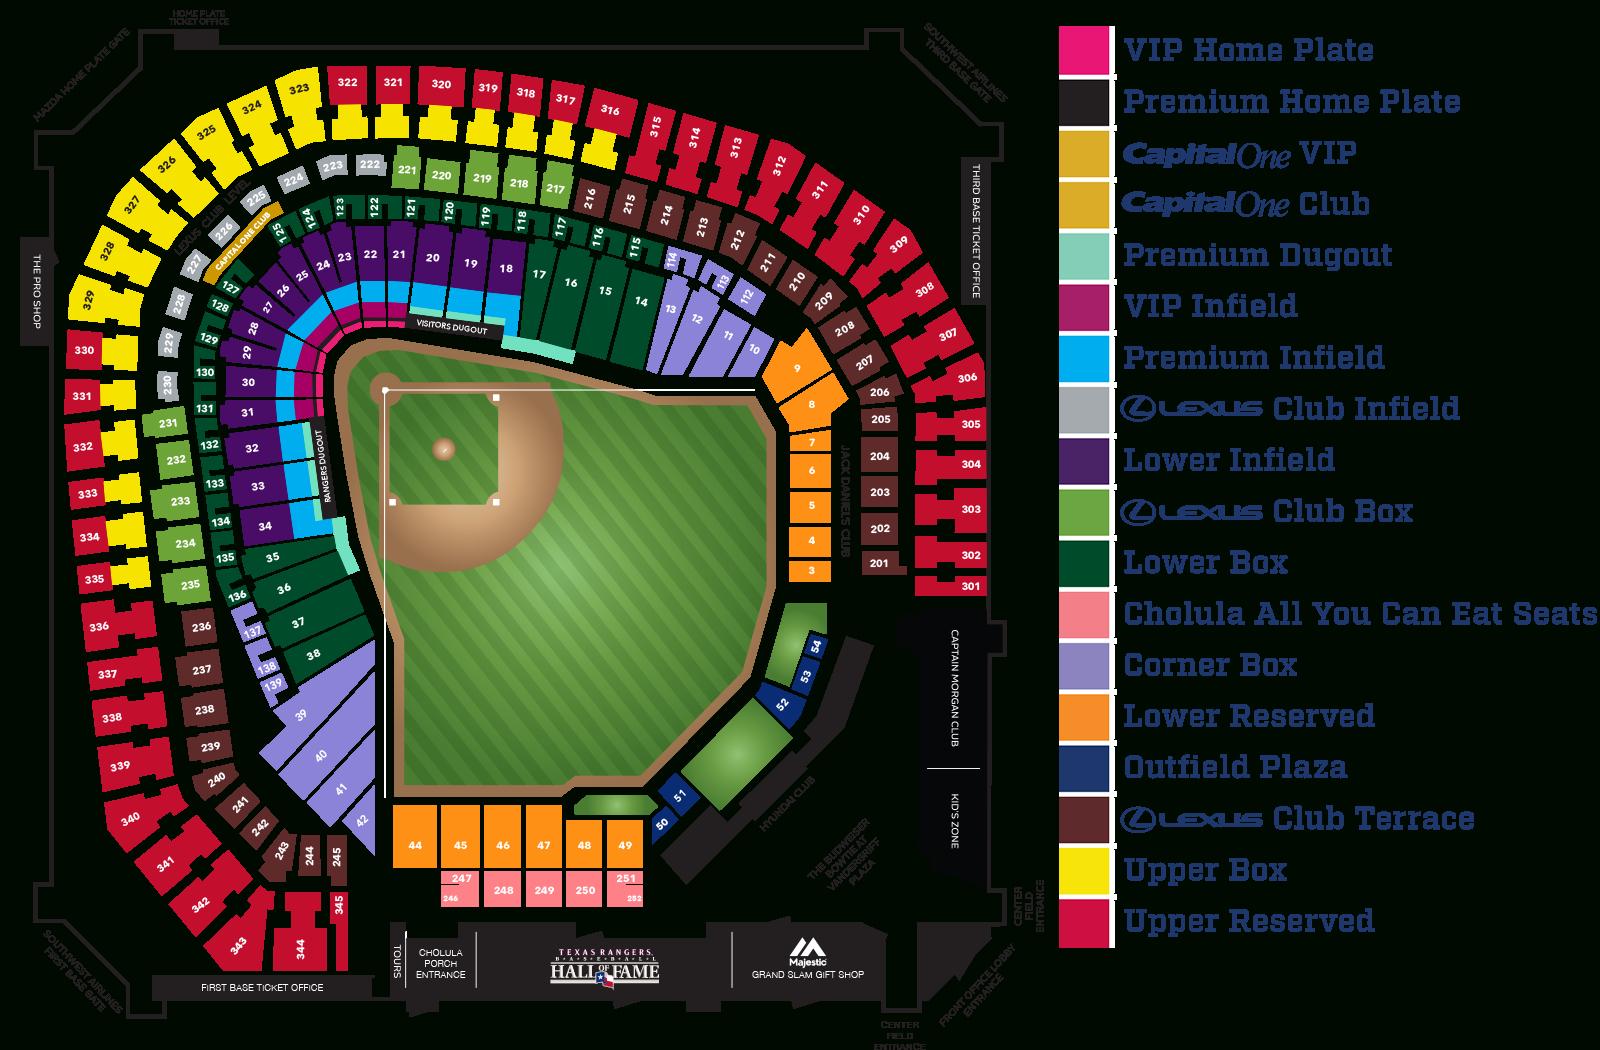 Globe Life Park Seating Map ~ Afp Cv - Texas Rangers Stadium Seating Map